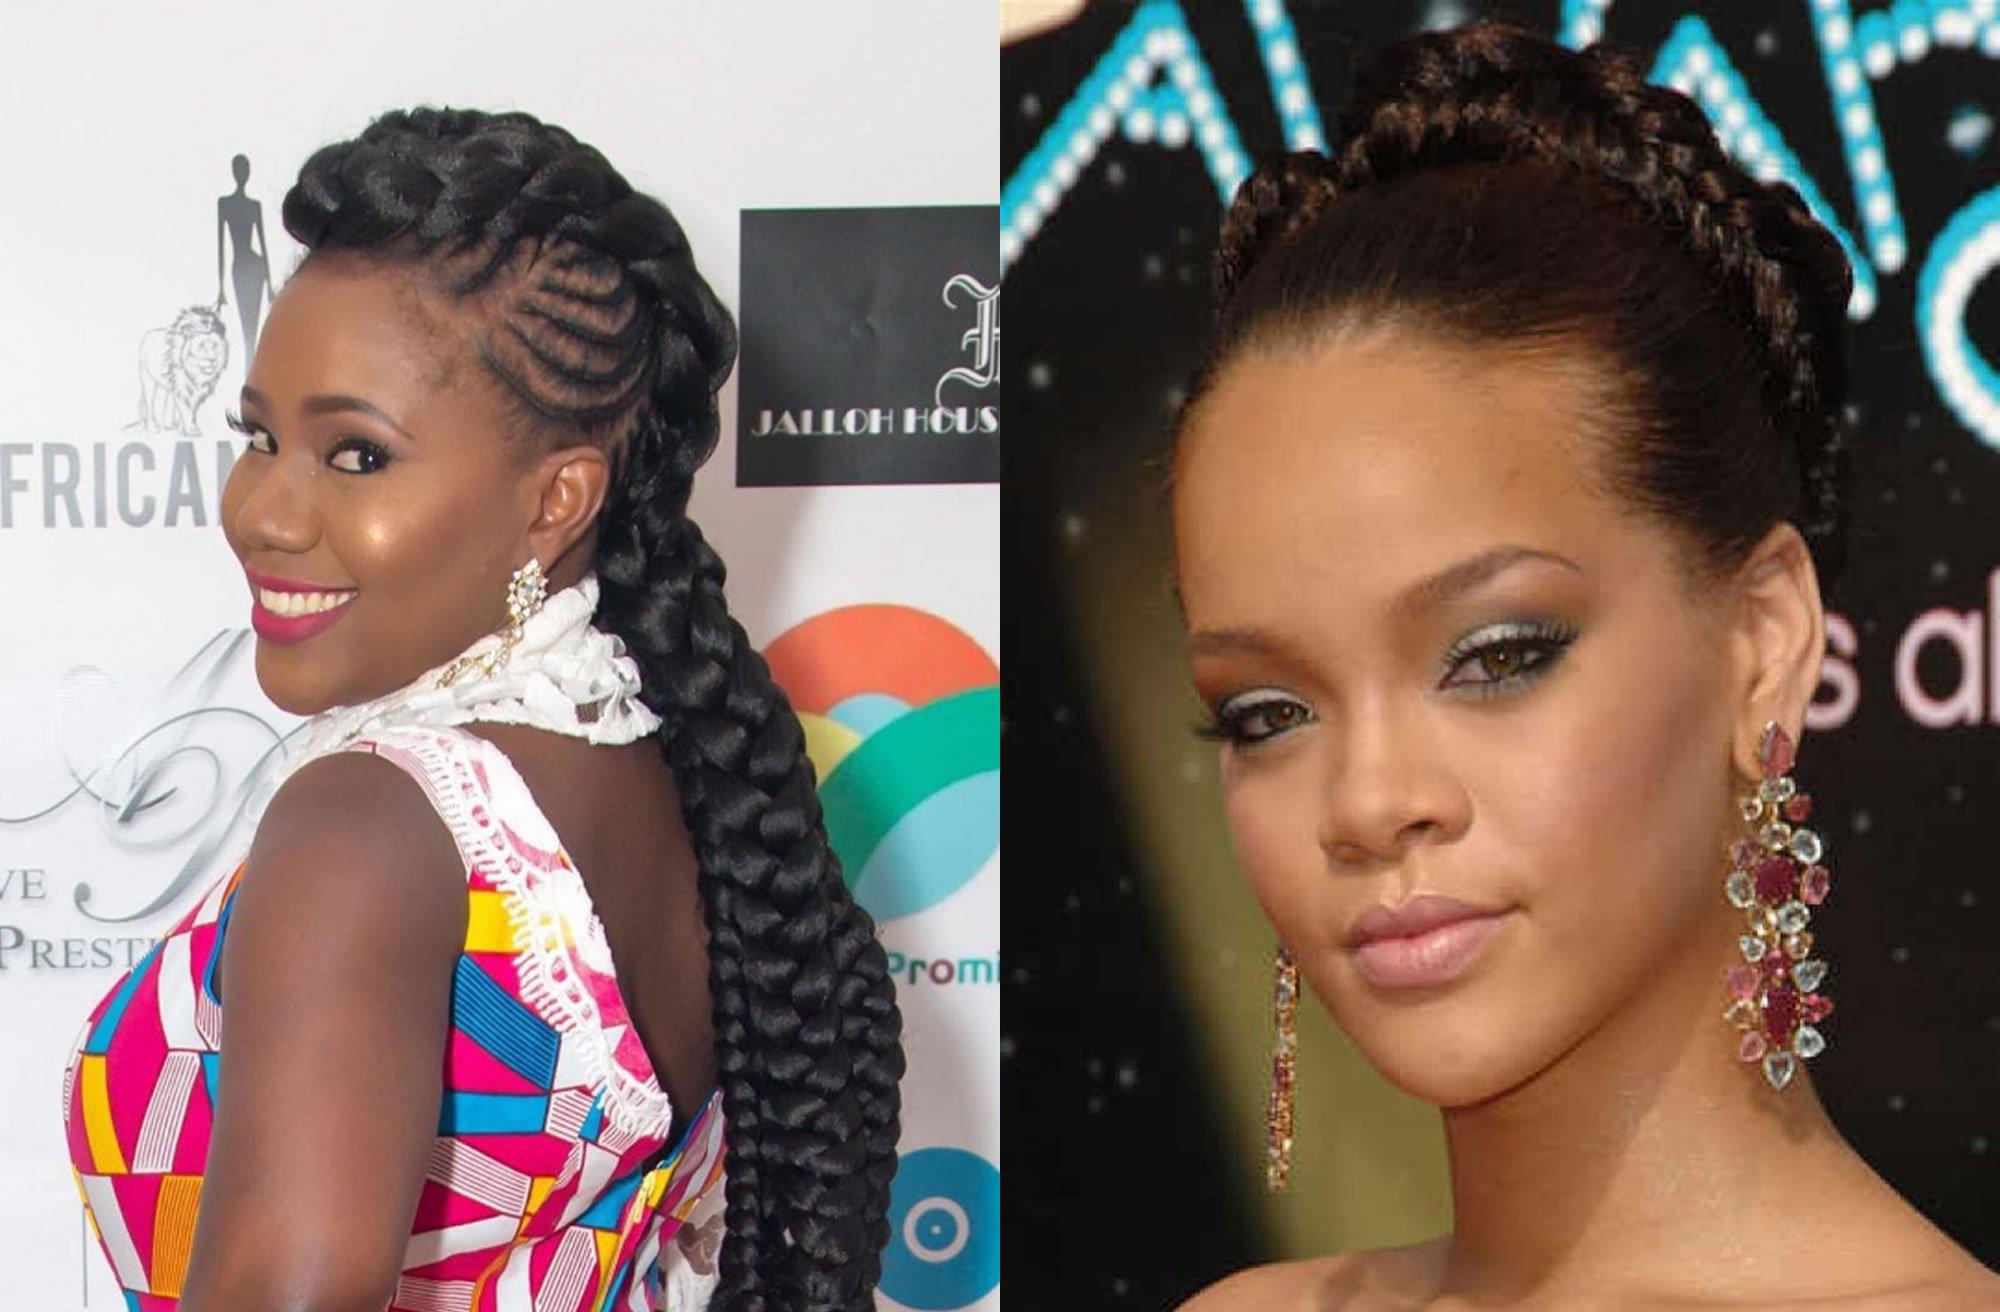 Hairstyles 2019 Black Female Braids: Braided Hairstyles For Black Women 2018-2019 Latest Hair